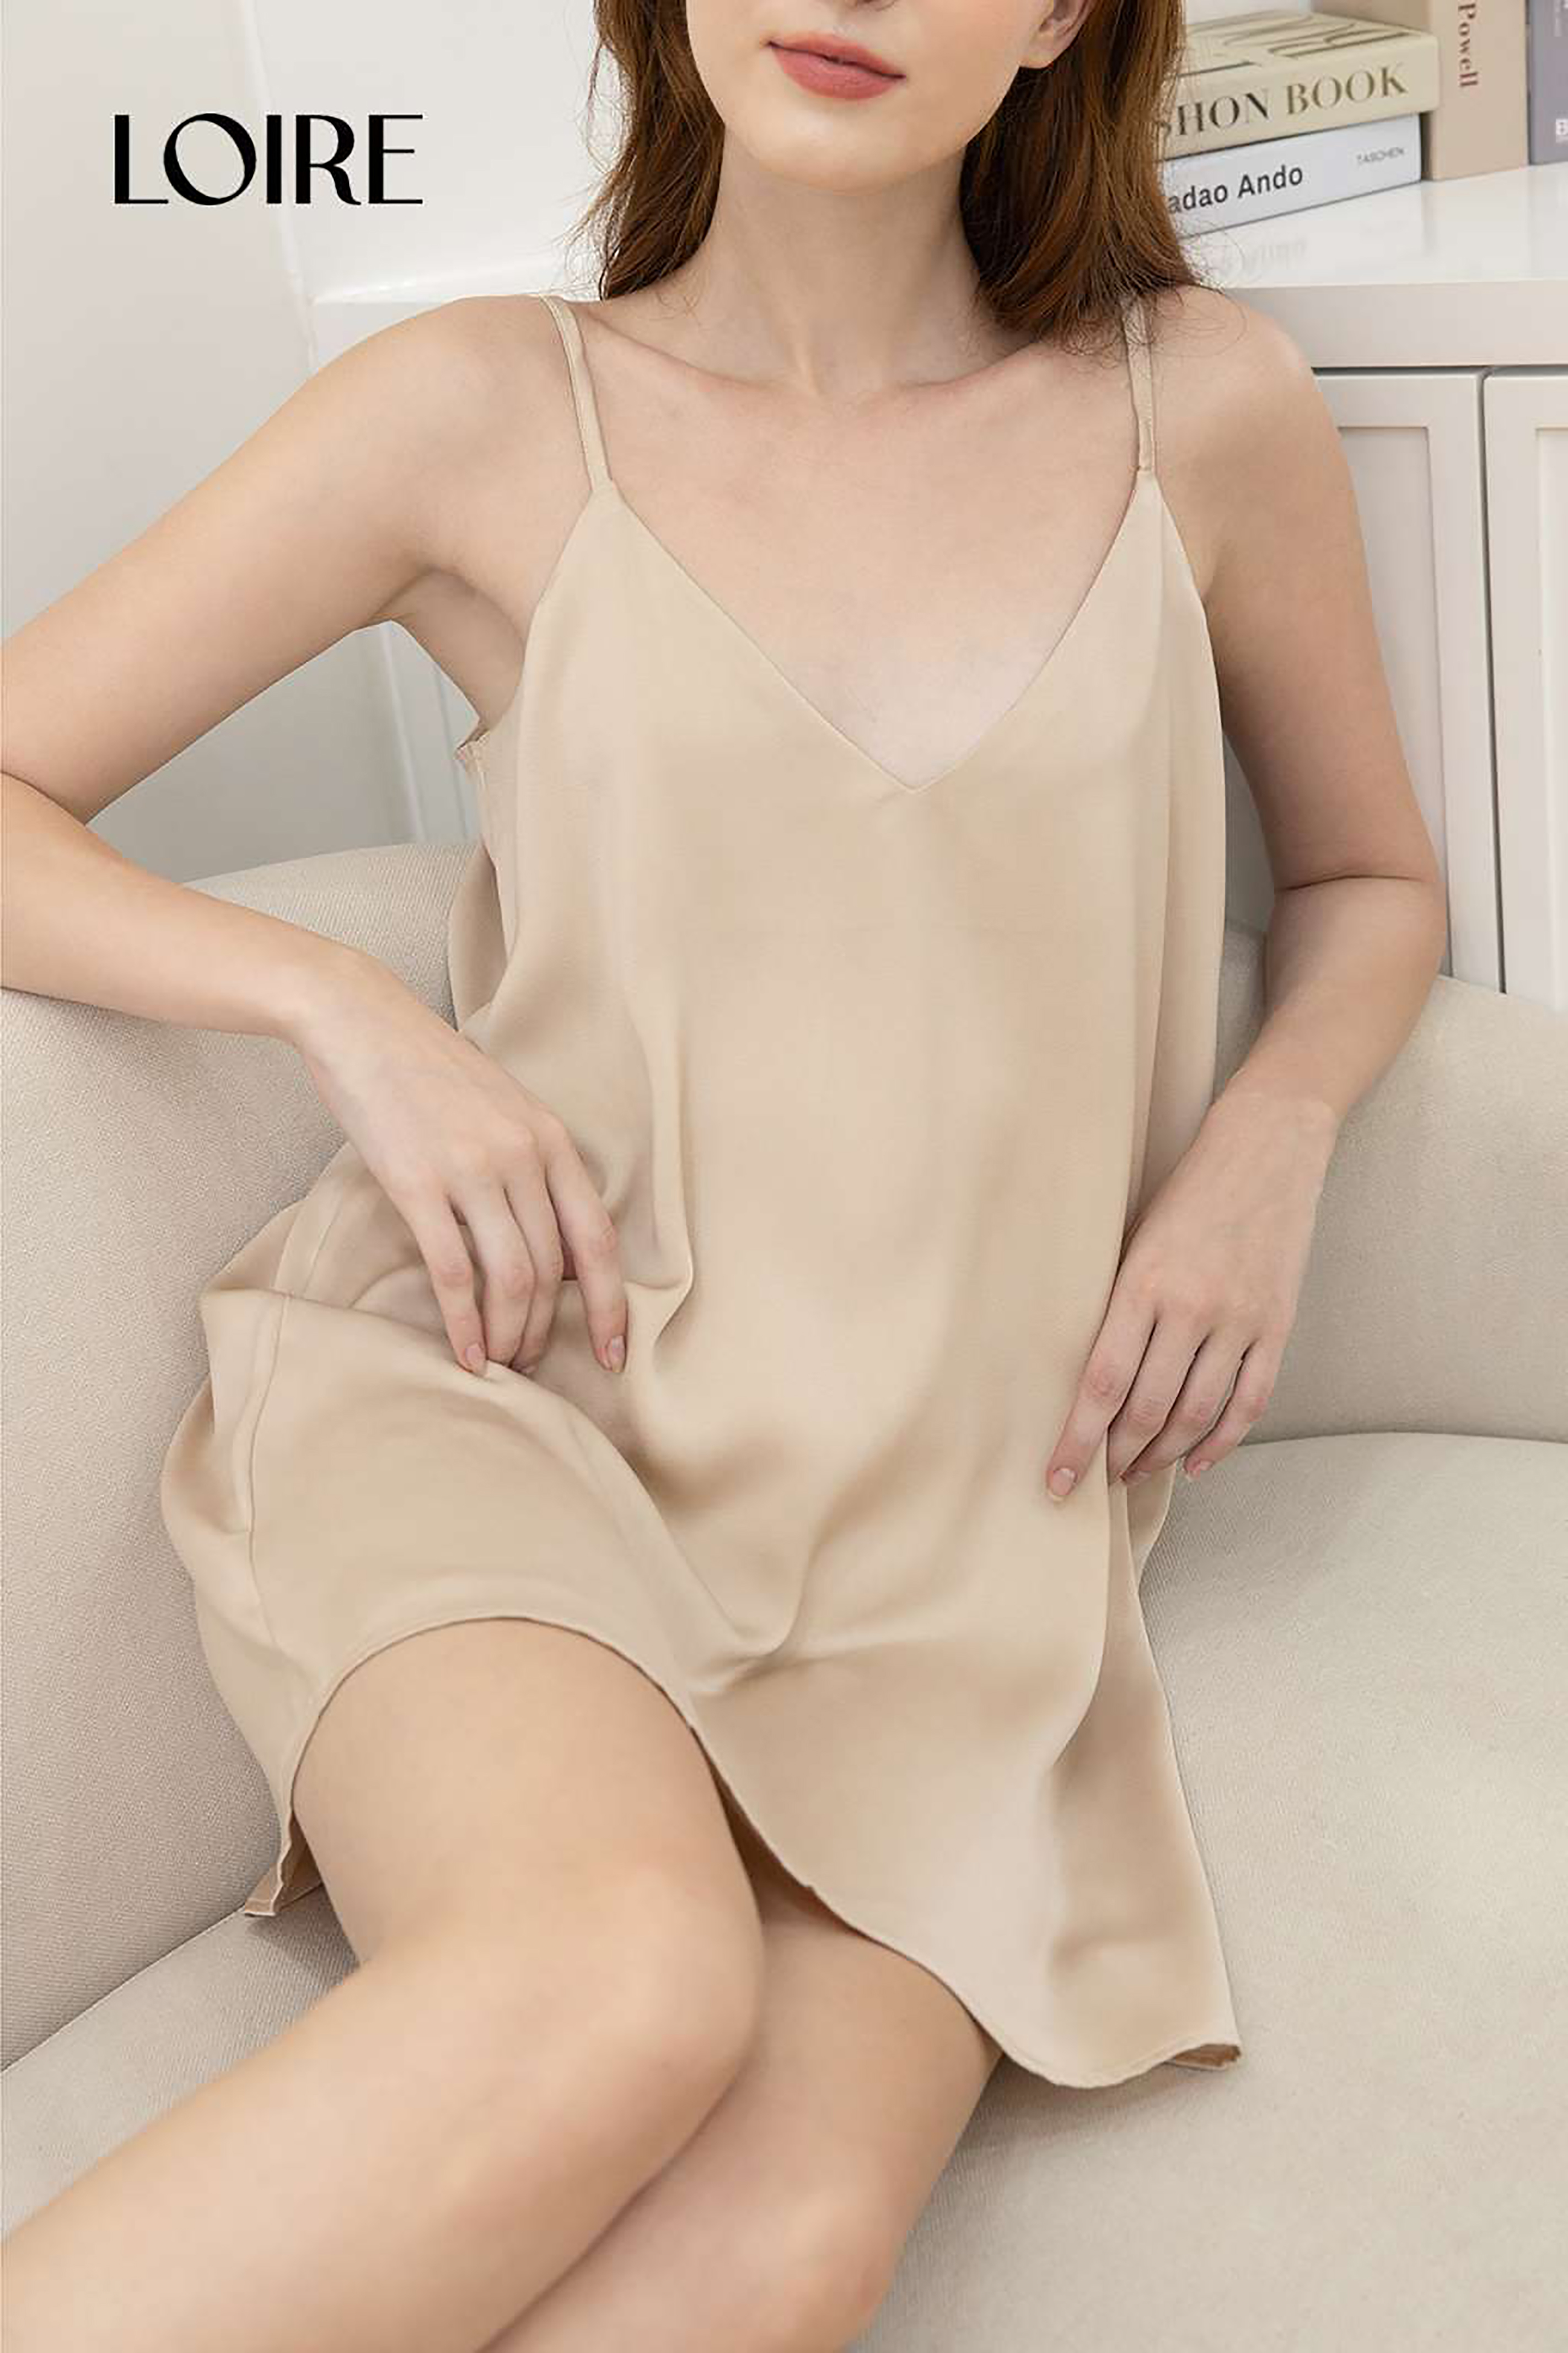 Váy Lụa 2 Dây Cao Cấp Loirechic LSL05